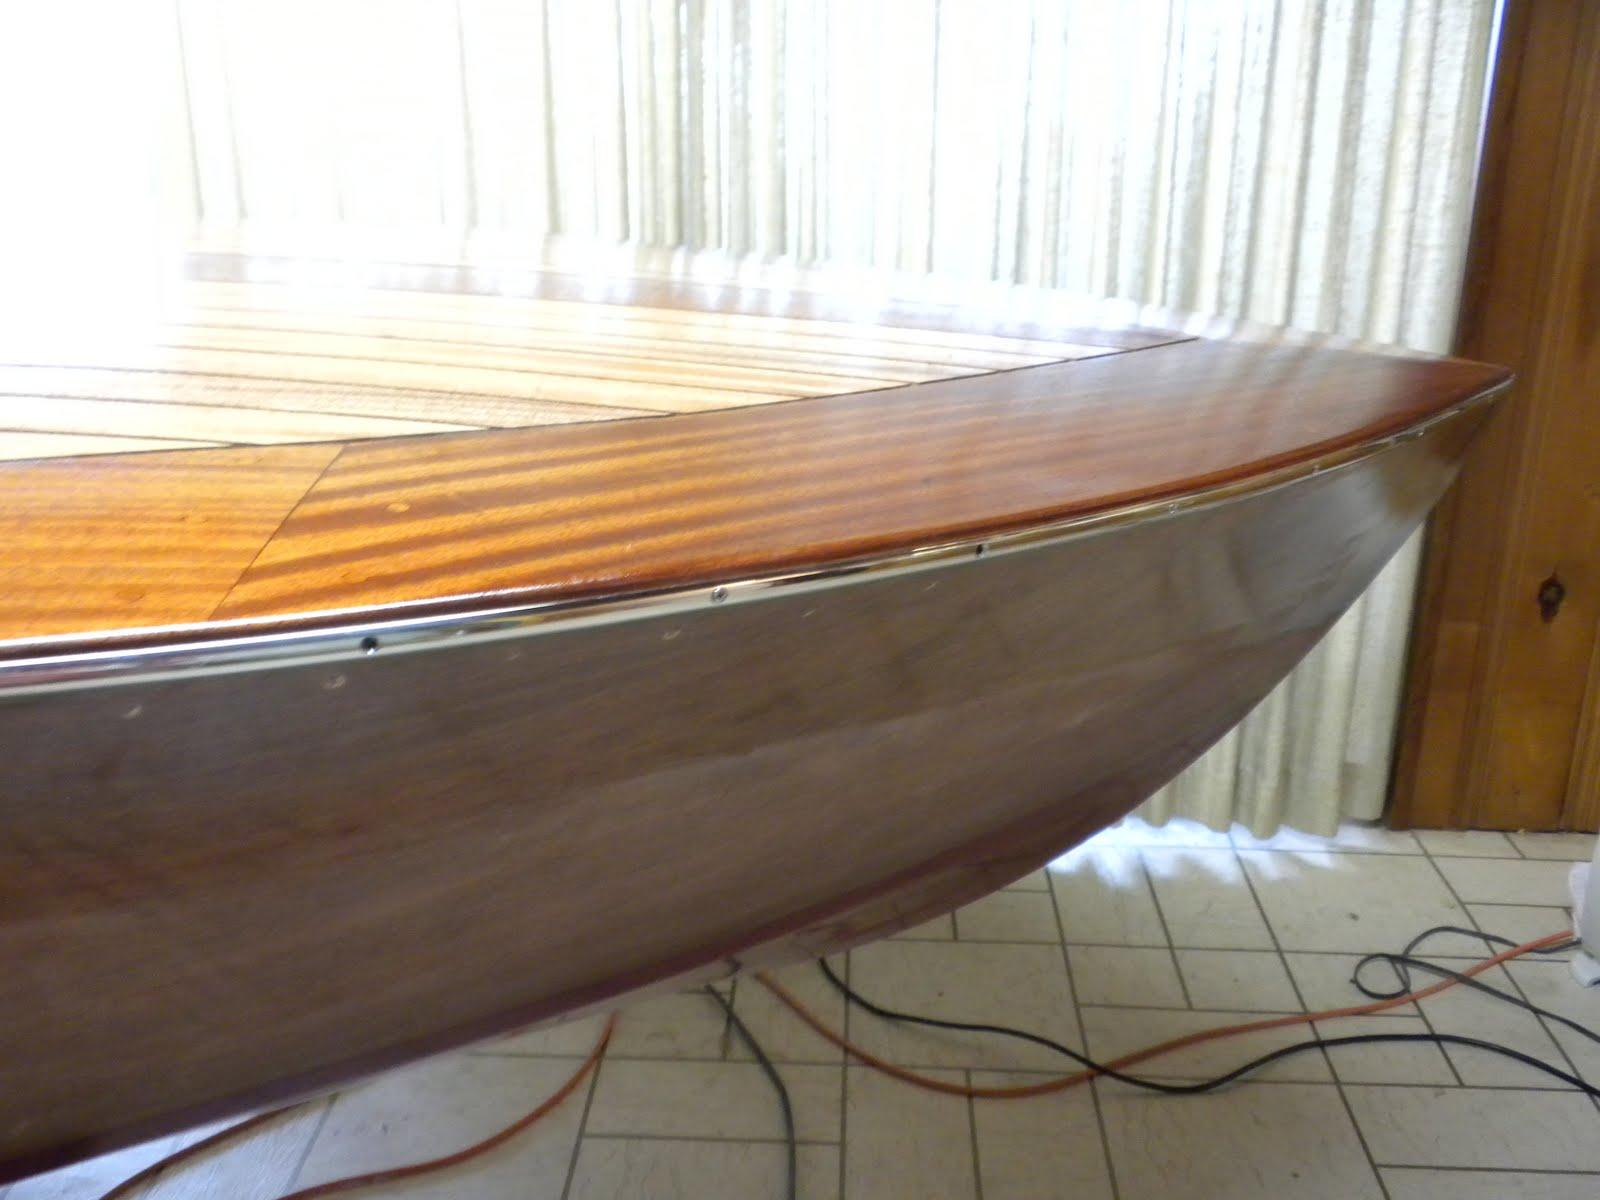 Marine Epoxy Paint For Wood : Jay wood boat epoxy coating how to building plans